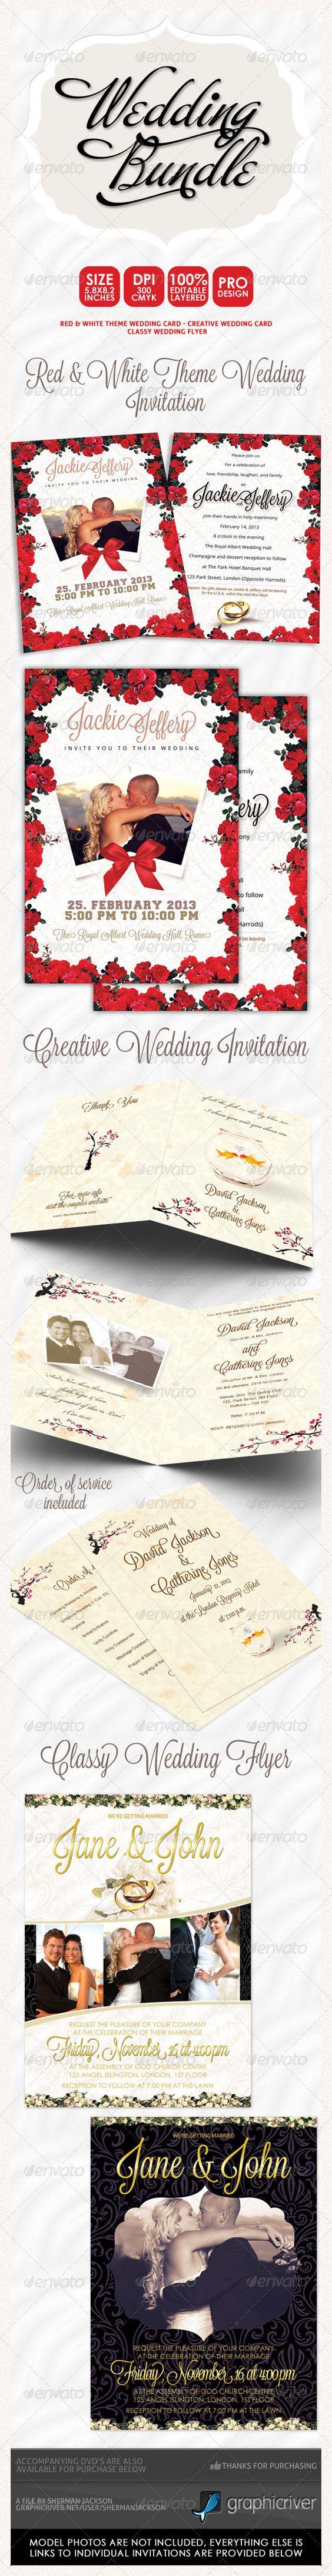 Wedding Invitation Bundle 3 — Photoshop PSD #birthday invitation #wedding invitations • Available here → https://graphicriver.net/item/wedding-invitation-bundle-3-/3948301?ref=pxcr